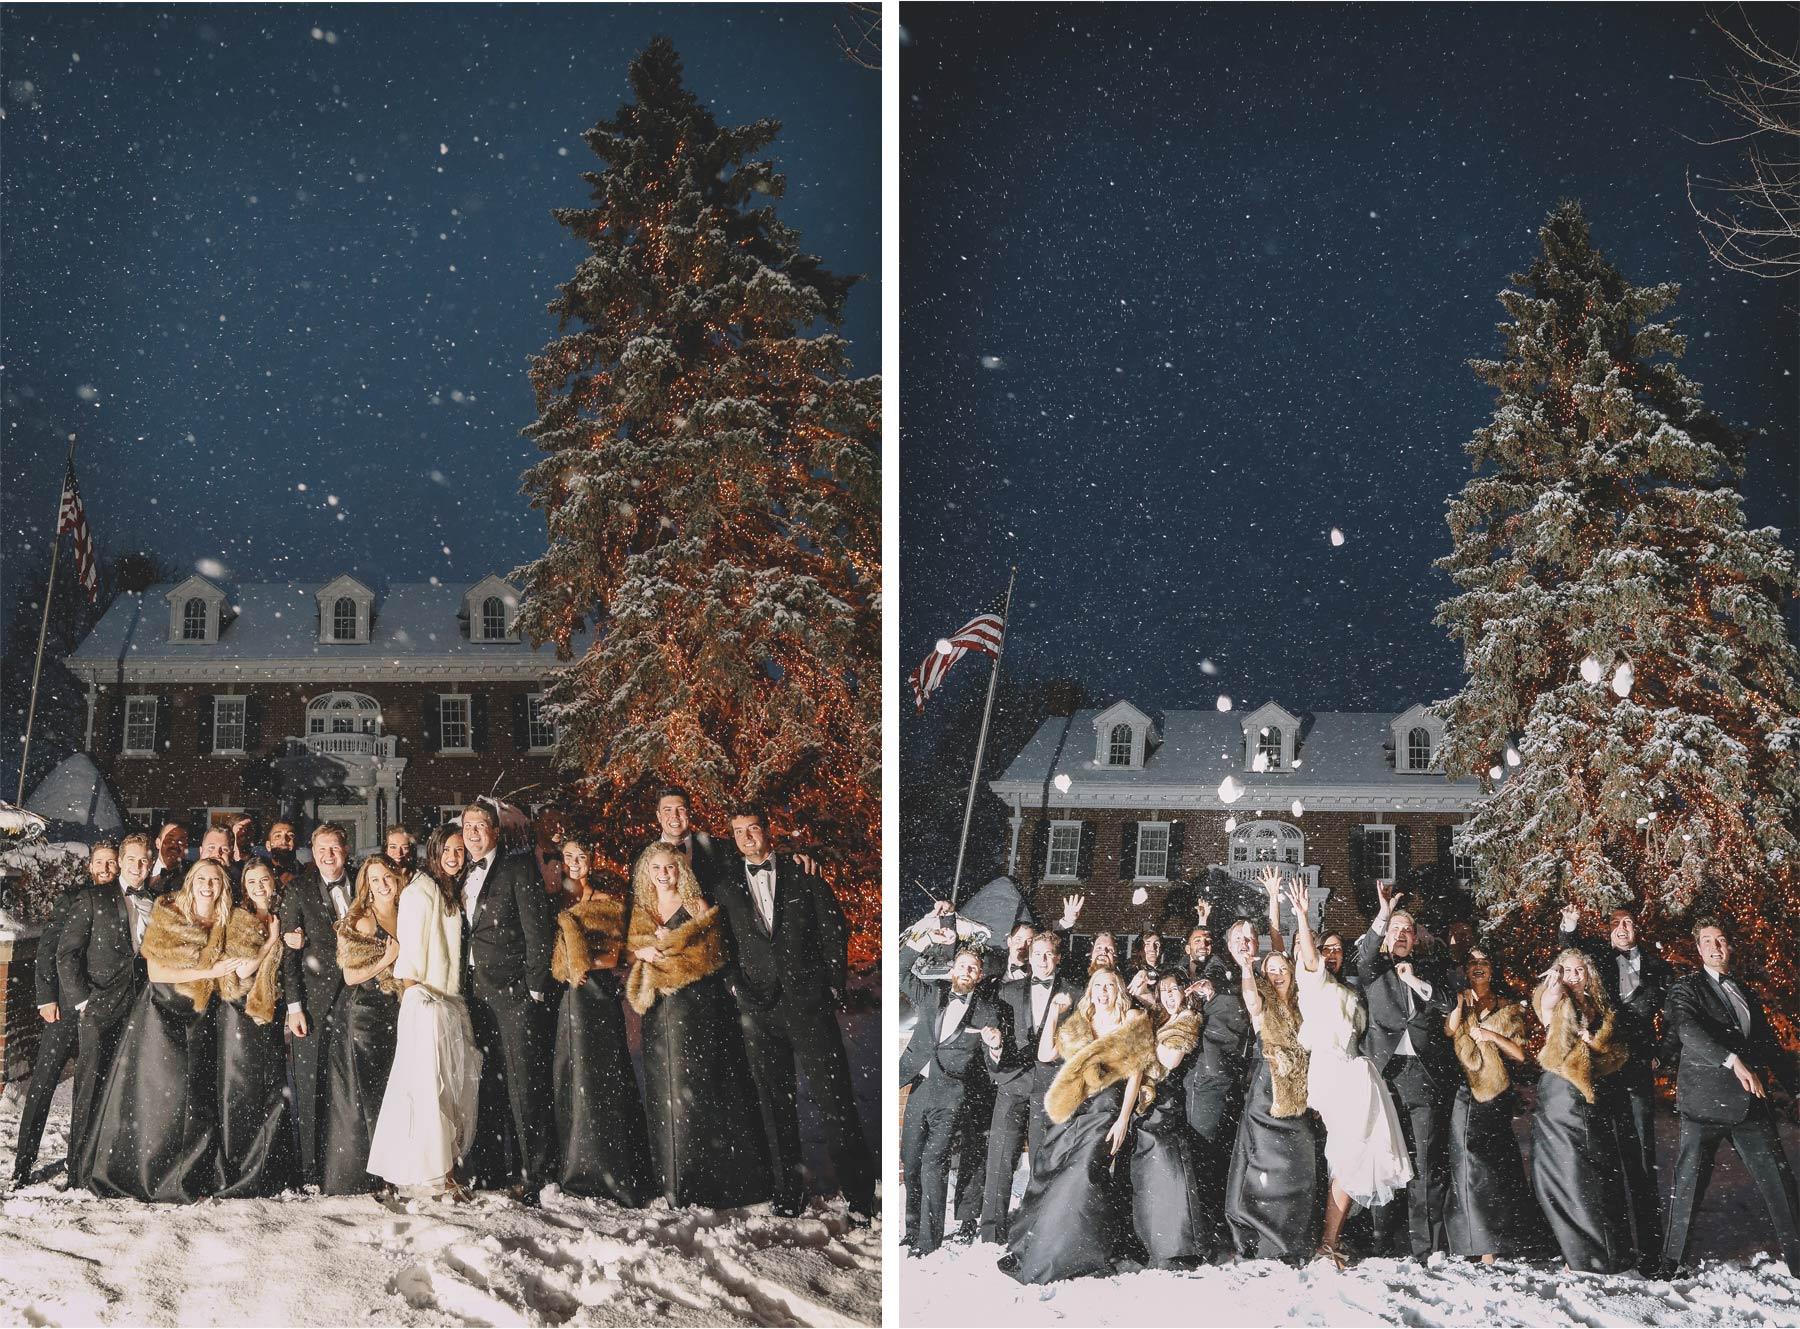 19-Saint-Paul-Minnesota-Wedding-Photography-by-Vick-Photography-Wedding-Party-Group-Snow-Ball-Fight-Winter-Wedding-Sami-and-Nick.jpg